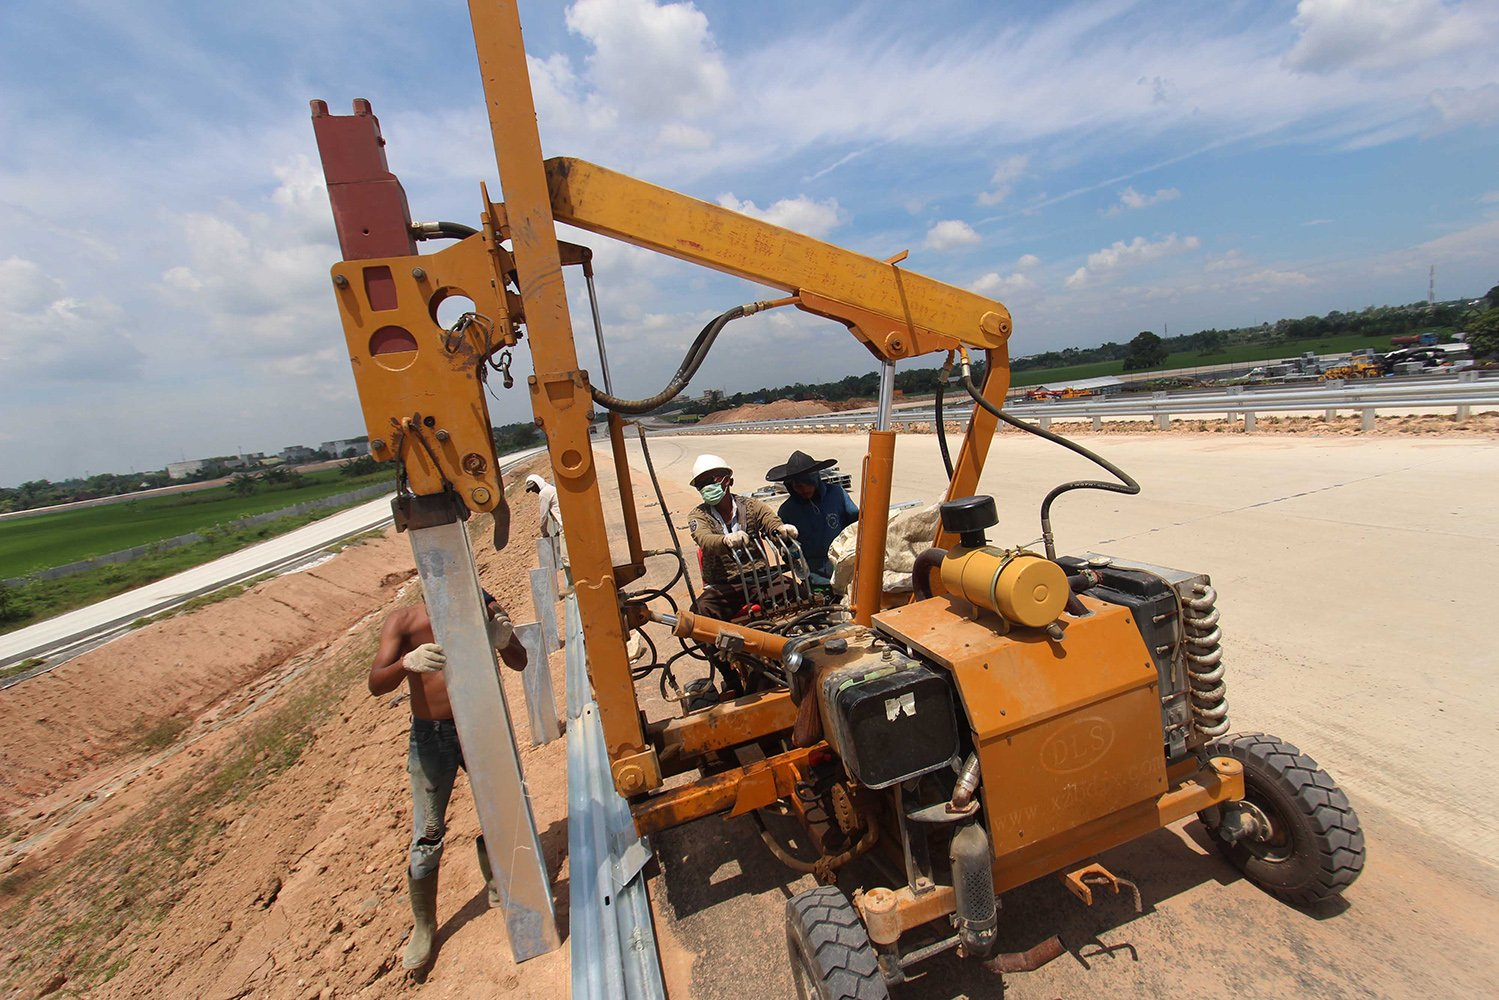 Pekerja menyelesaikan proyek pembangunan Jalan Tol Medan-Lubuk Pakam-Tebing Tinggi, di Deli Serdang, Sumatera Utara, Minggu (4/6).